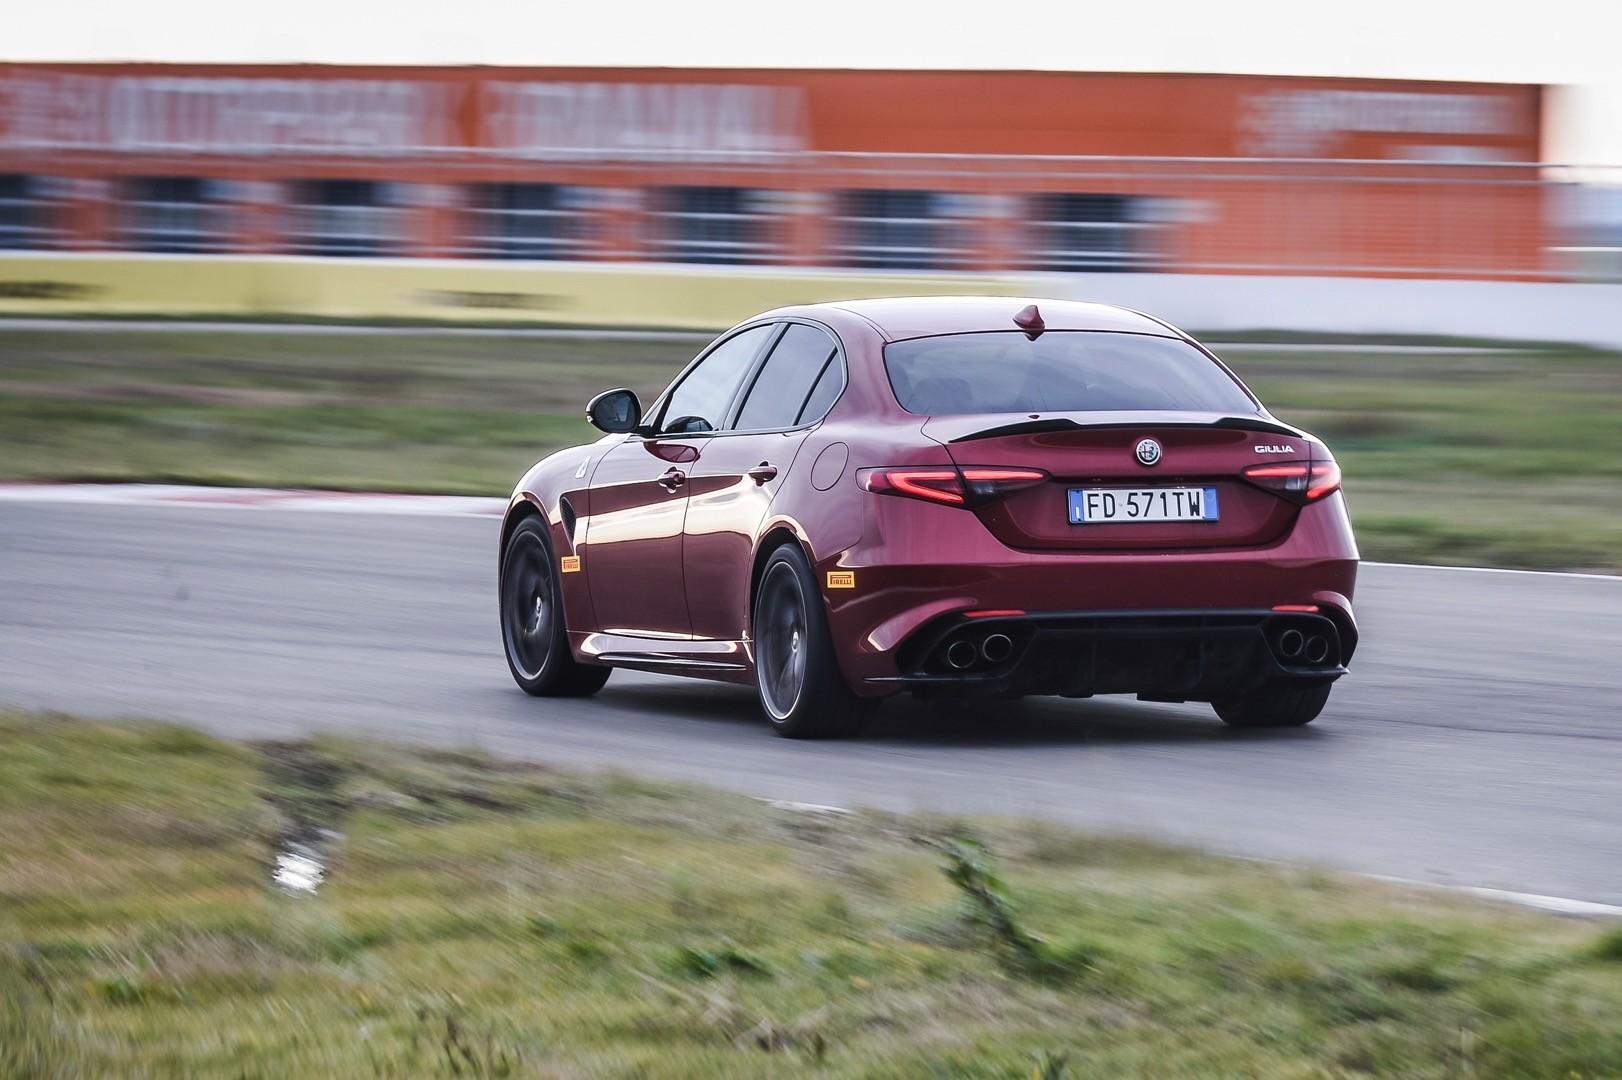 2021 Alfa Romeo Giulia GTA Rumored With 620 HP - autoevolution